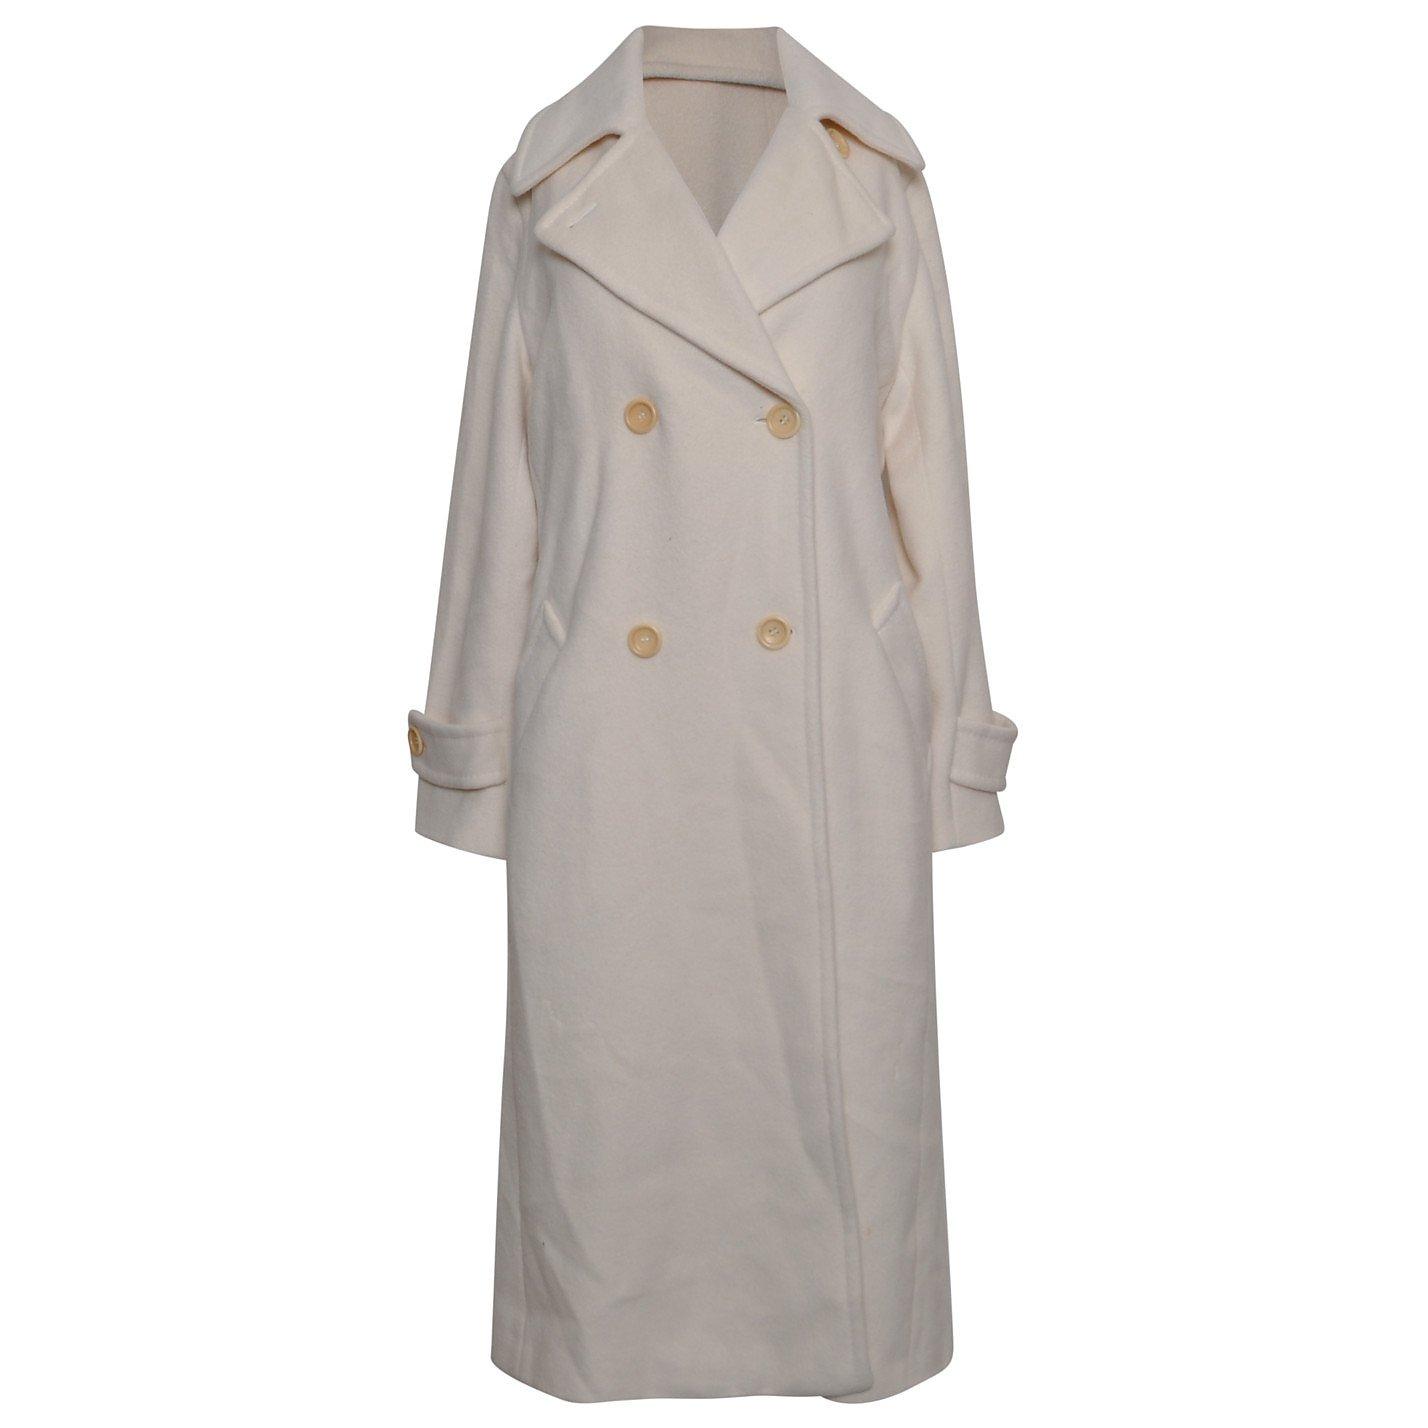 Gérard Darel Long Woolen Coat